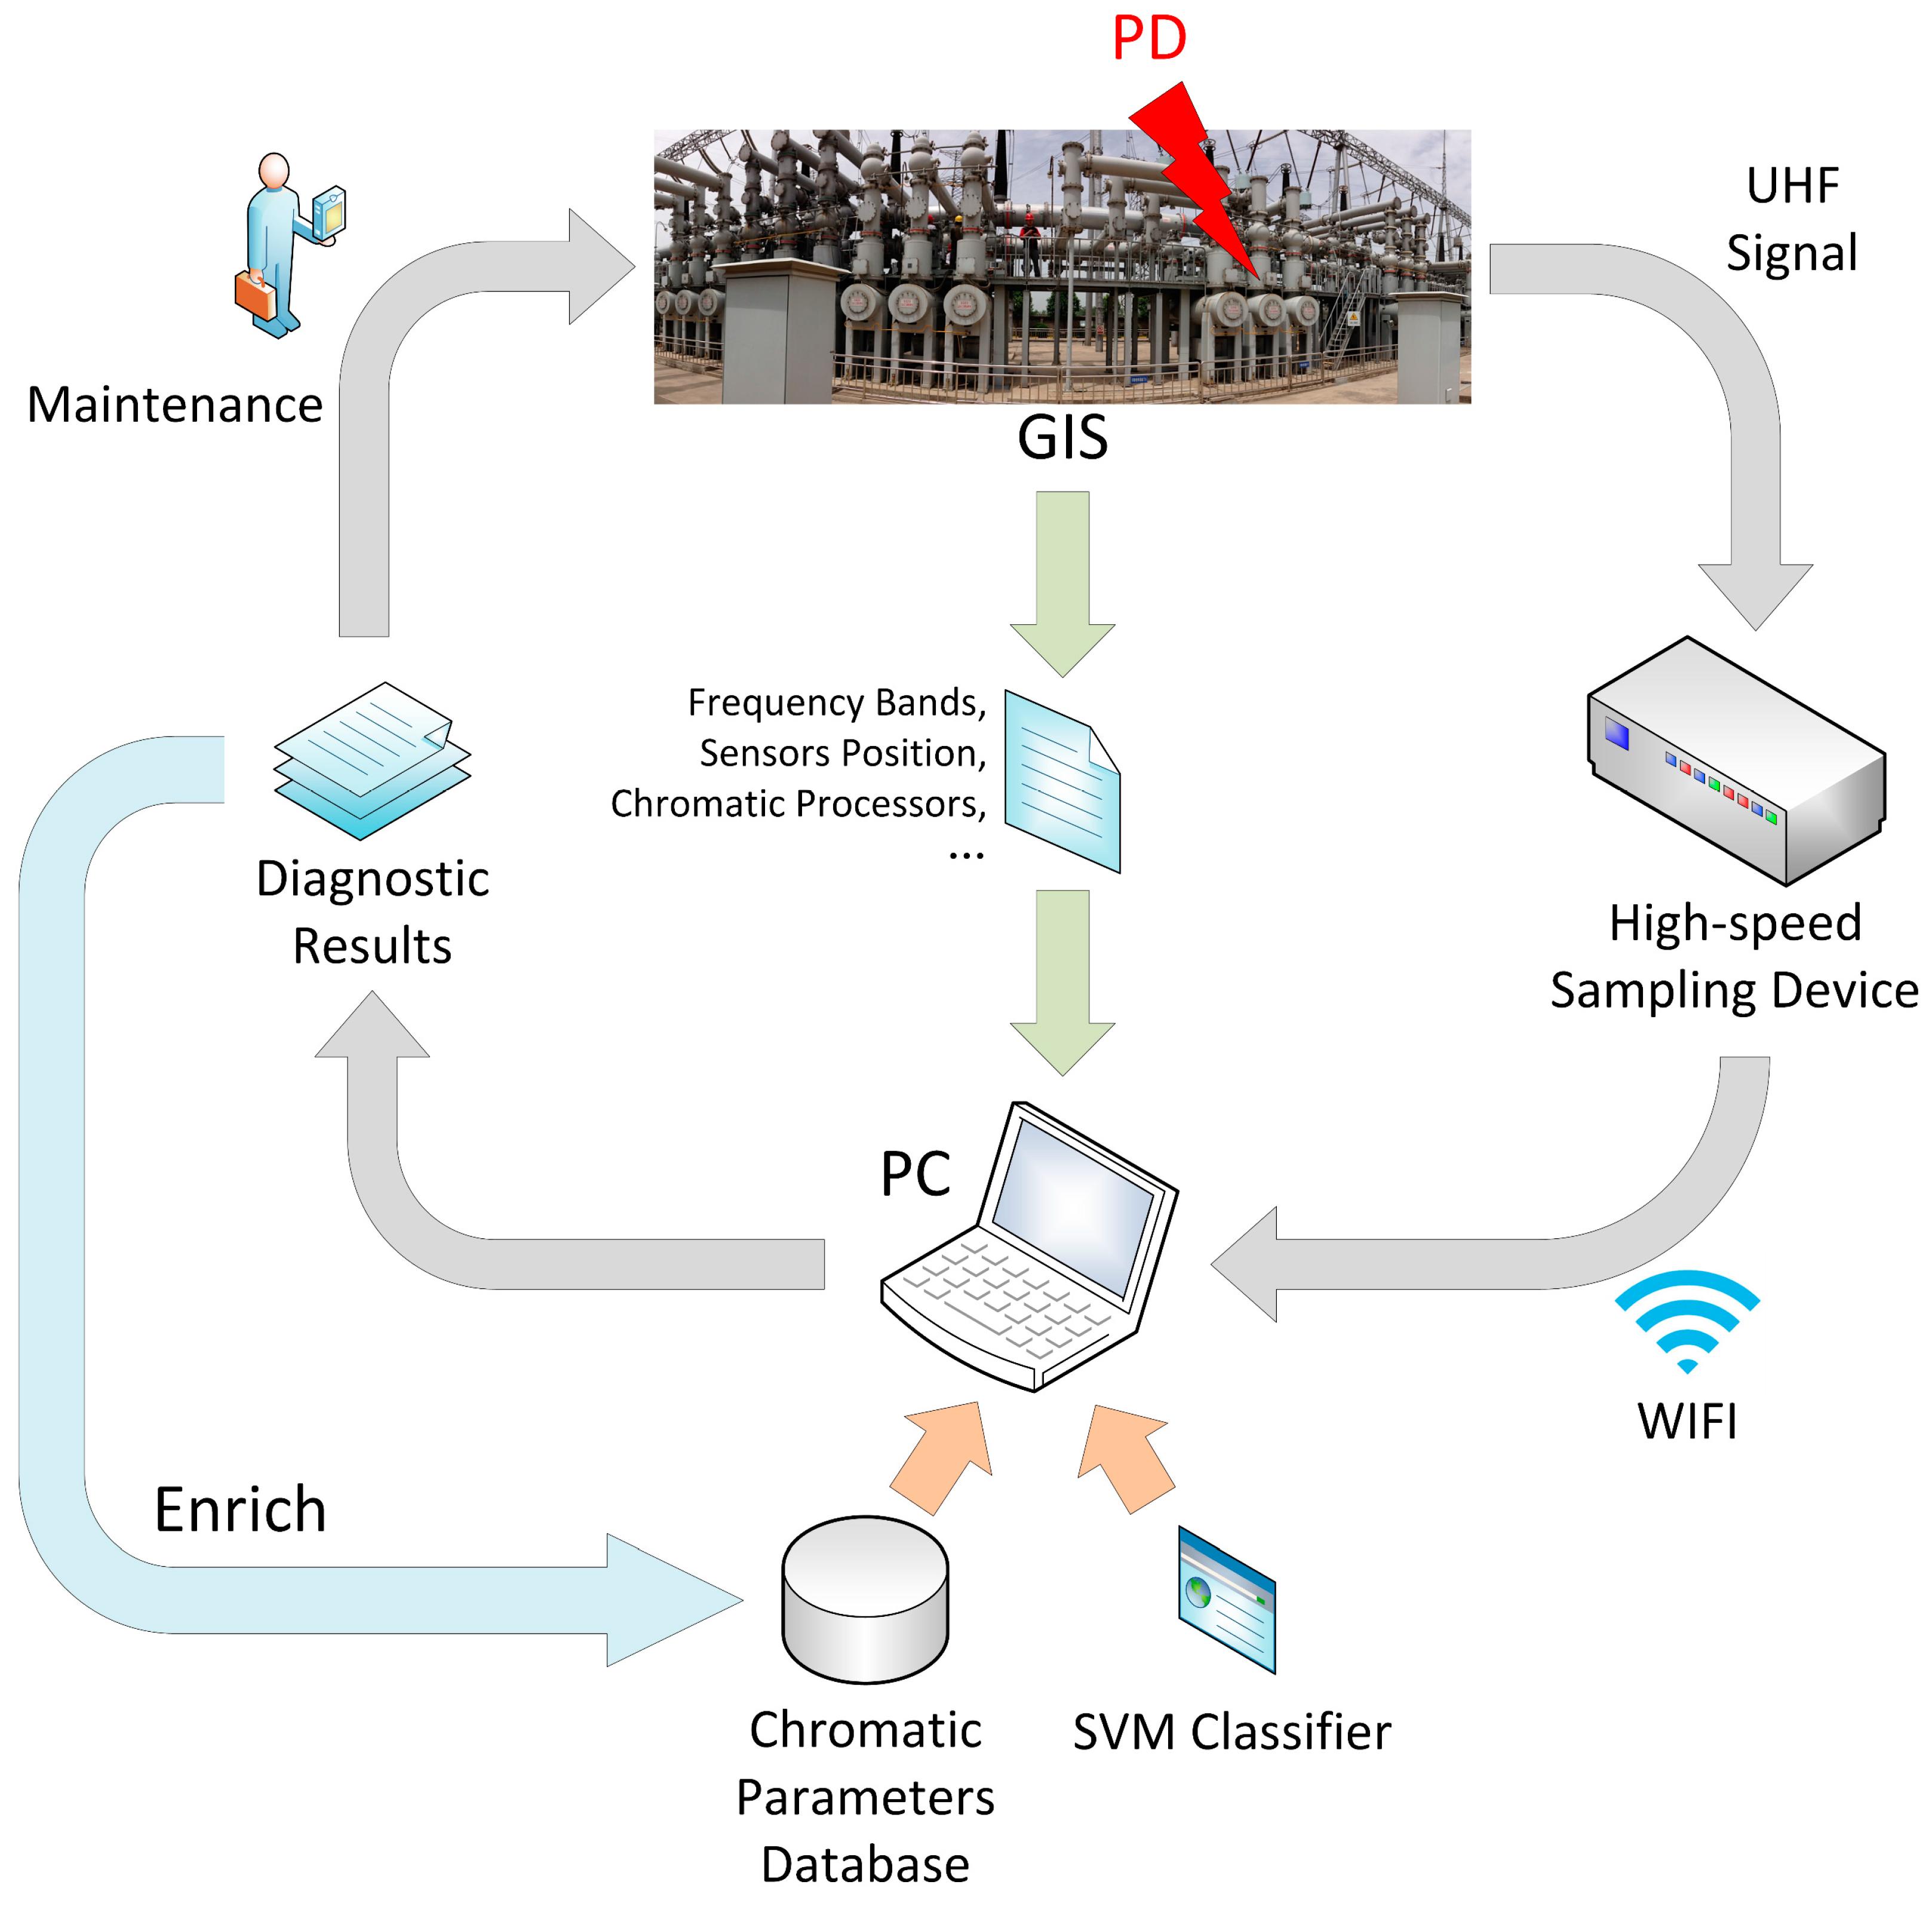 Sensors   Free FullText   UHF Signal Processing and